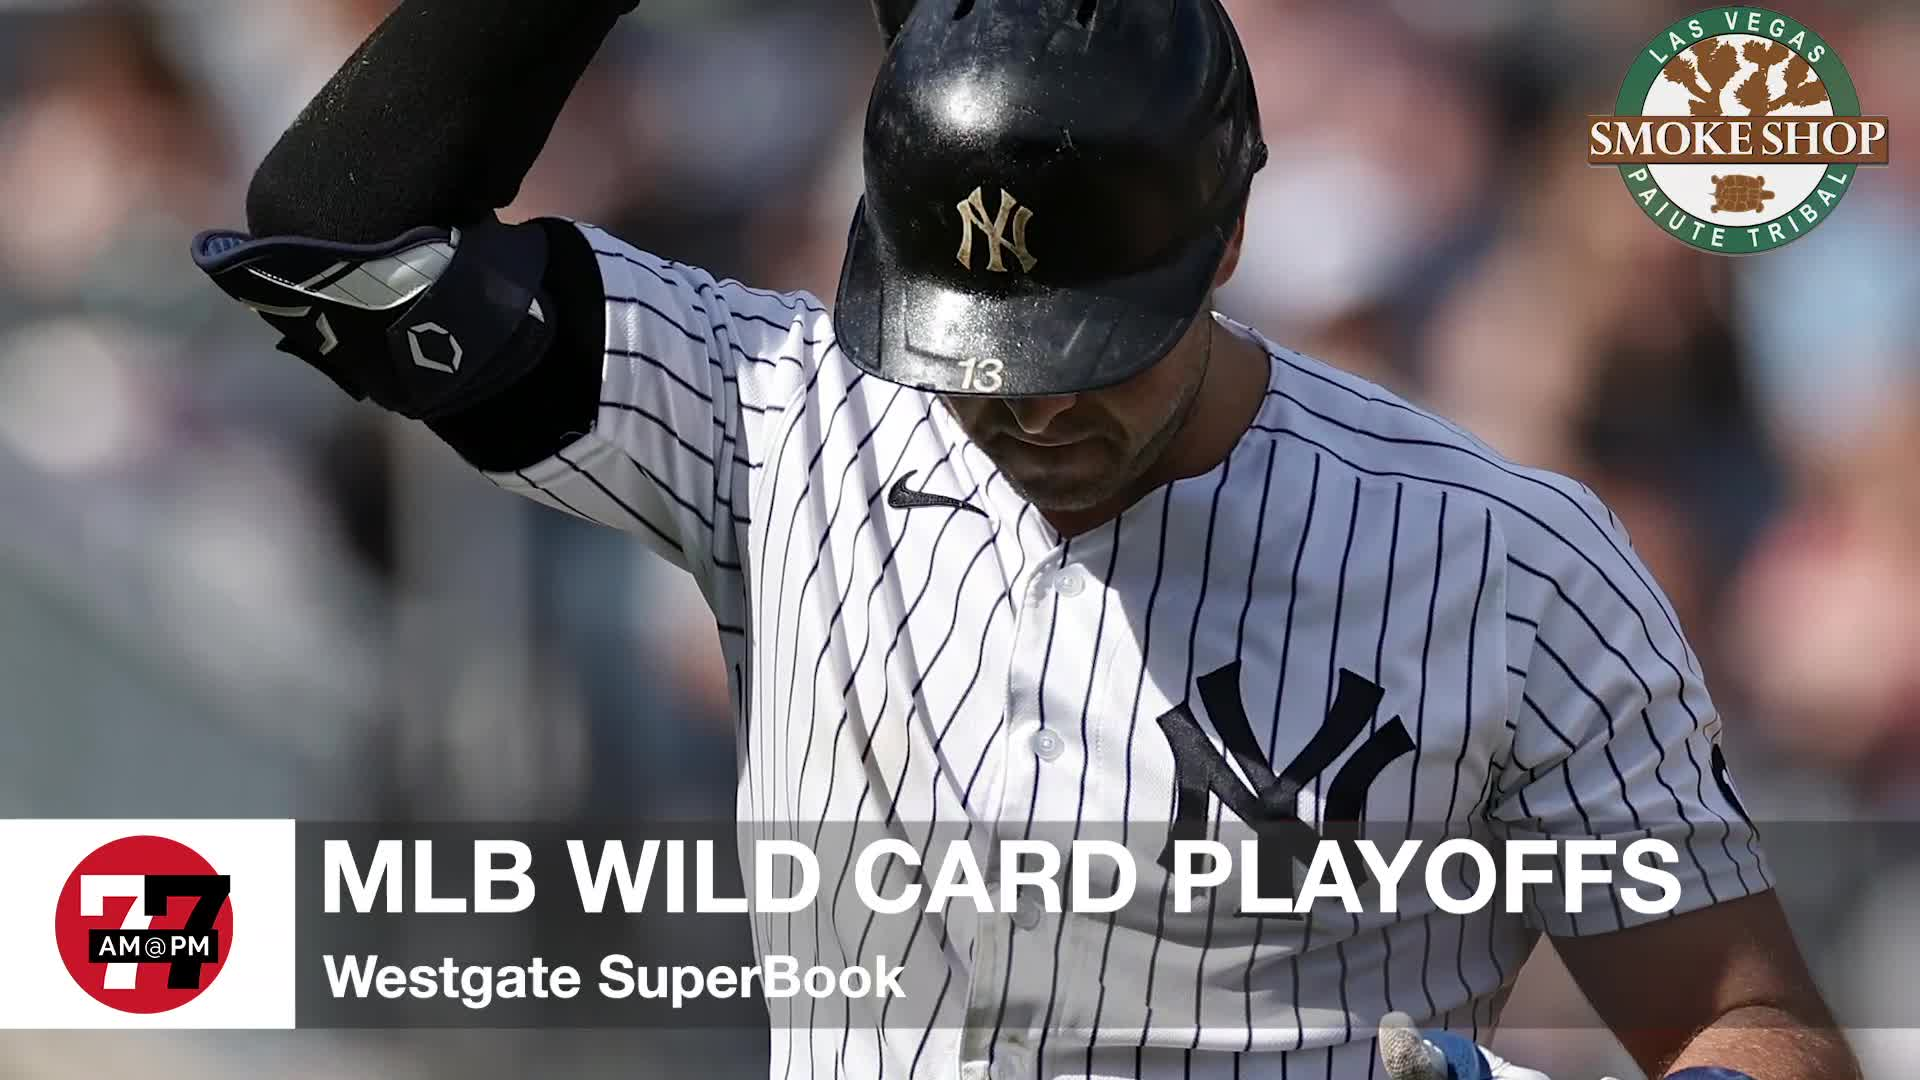 7@7PM MLB Wild Card Odds